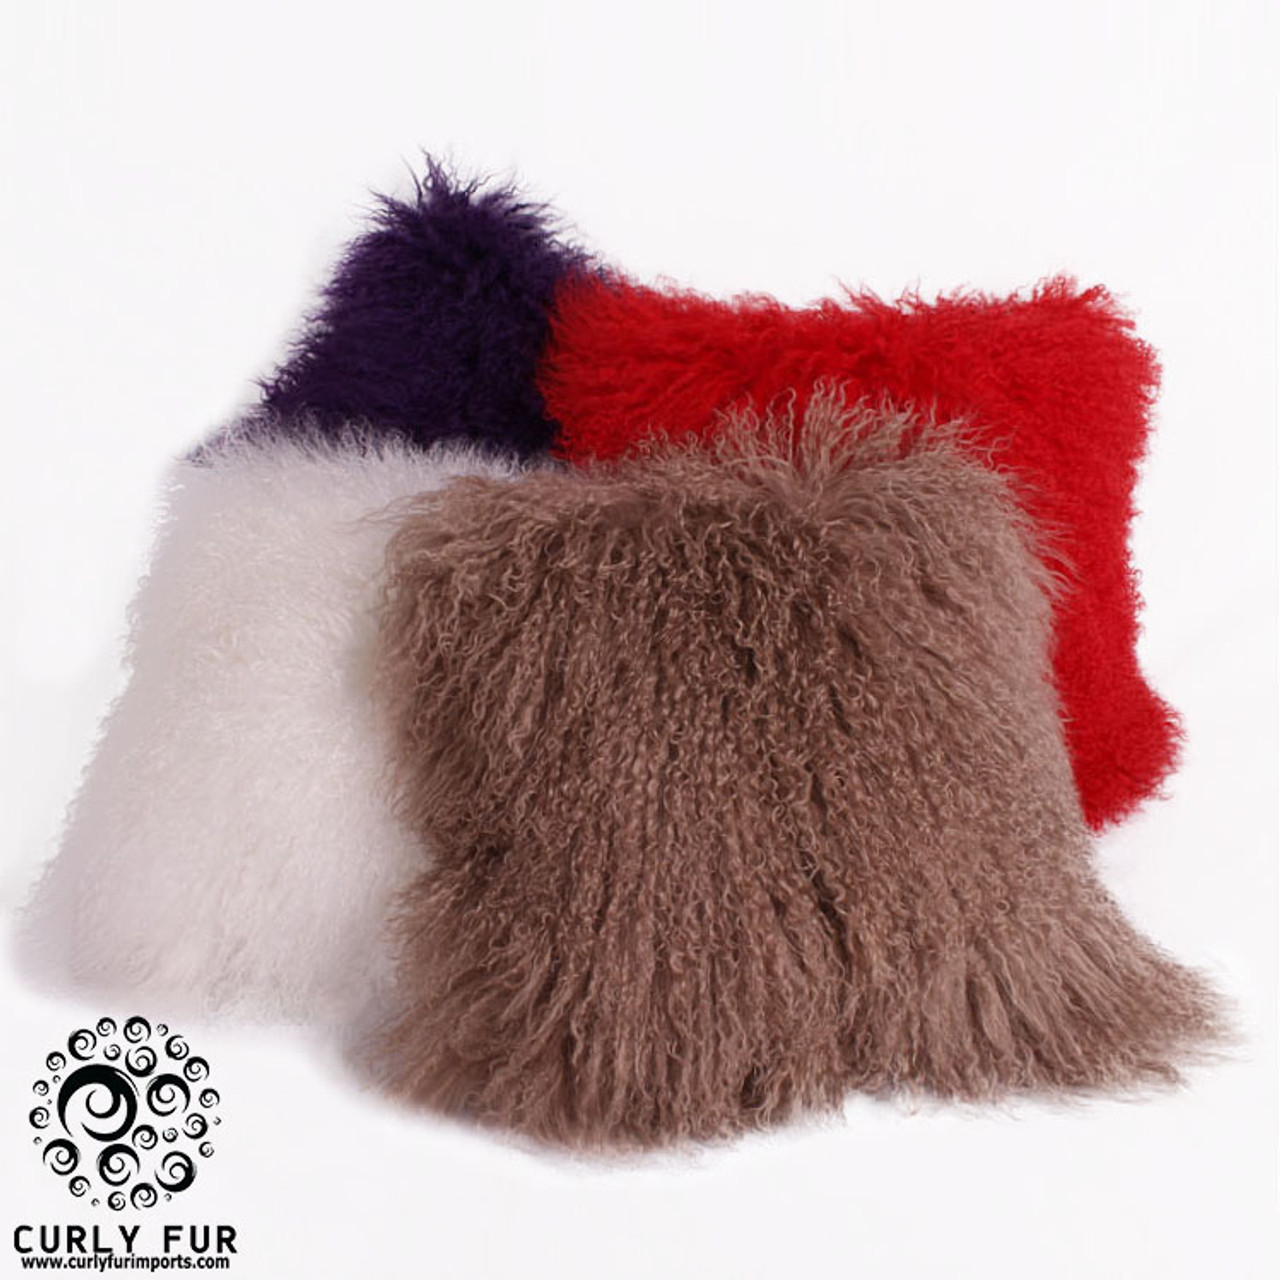 26 x 26 tibetan mongolian lamb fur pillow double sided fur many colors